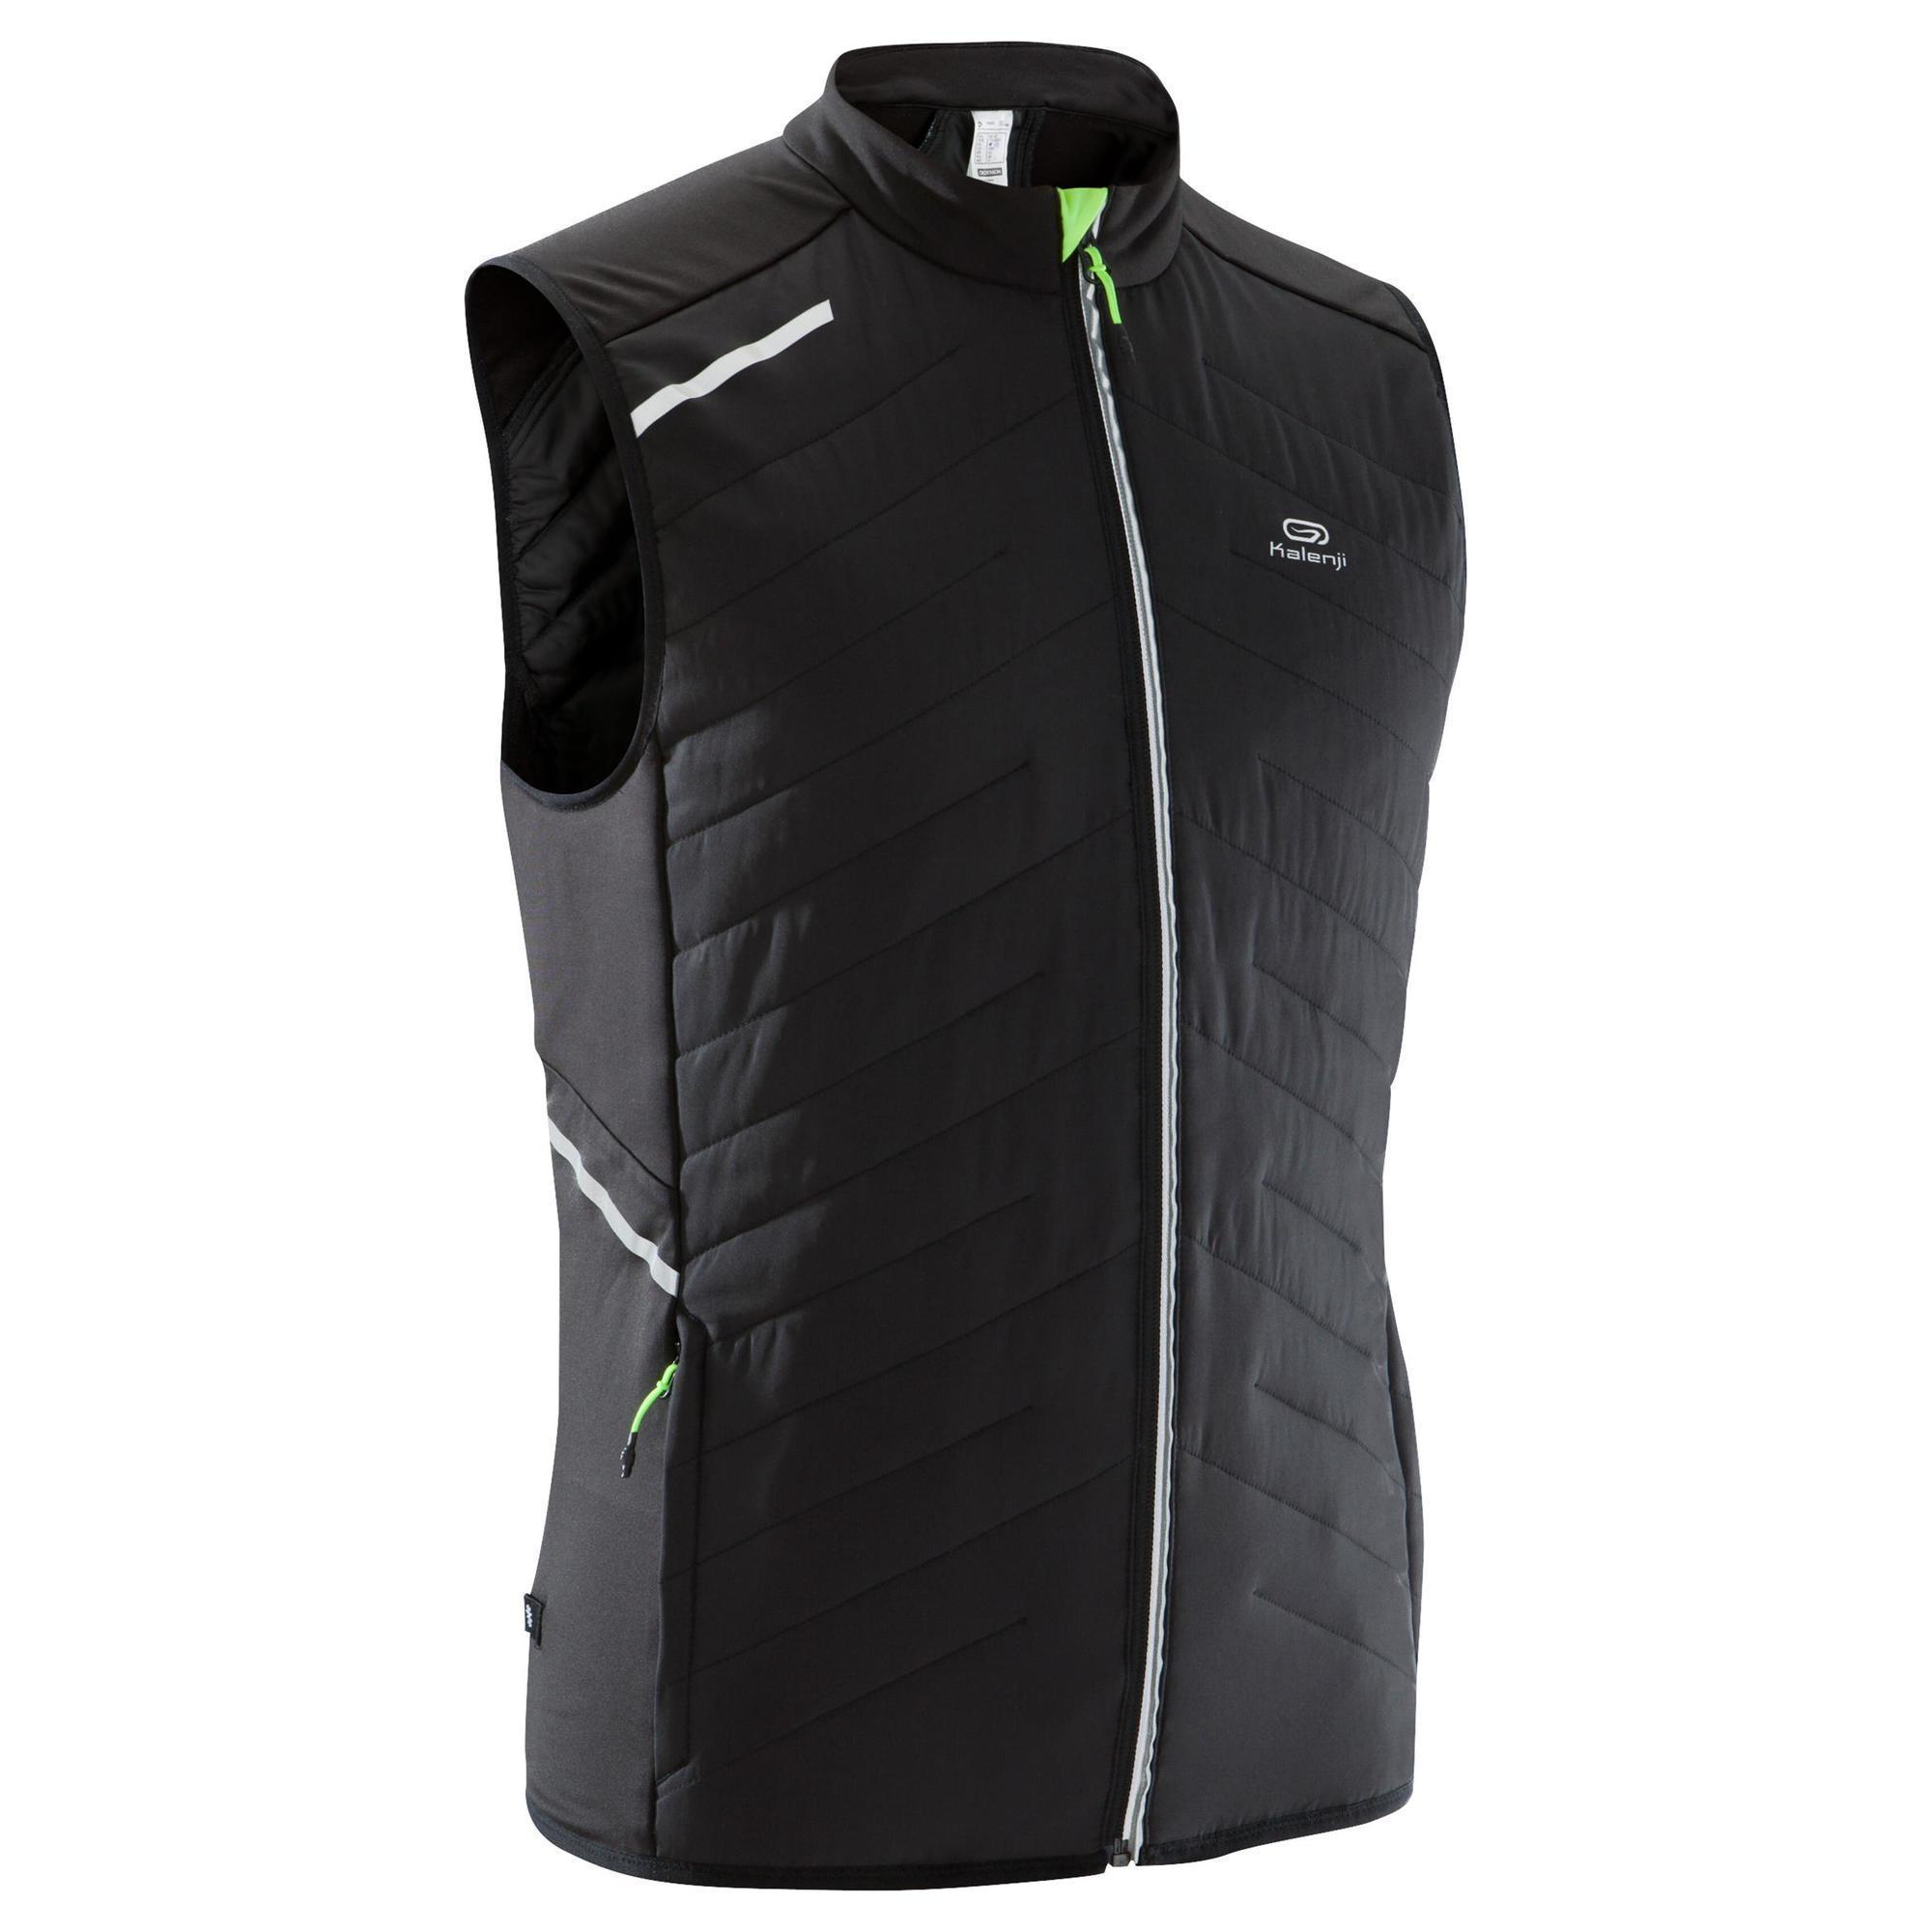 Laufweste Run Warm+ Herren schwarz | Sportbekleidung > Sportwesten > Laufwesten | Kalenji